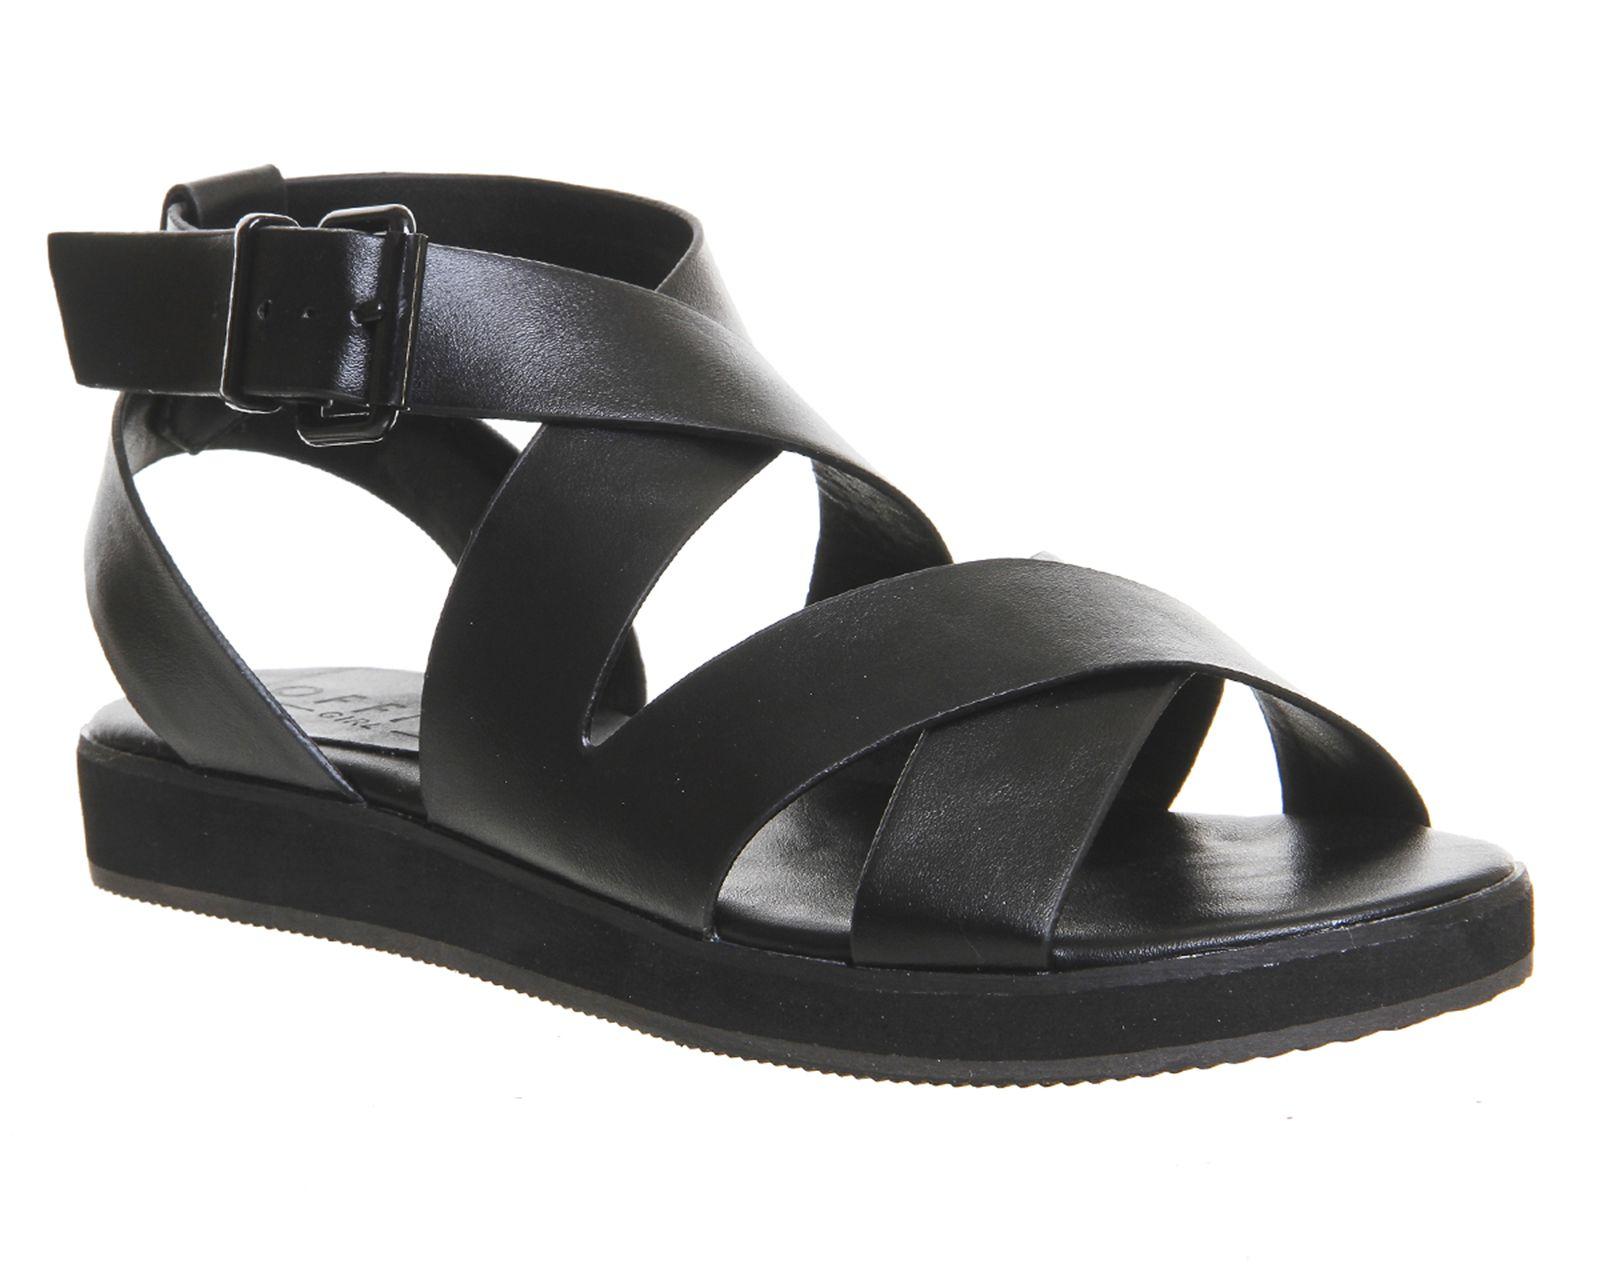 Black Office Bounce Sporty Sandal From Co Uk